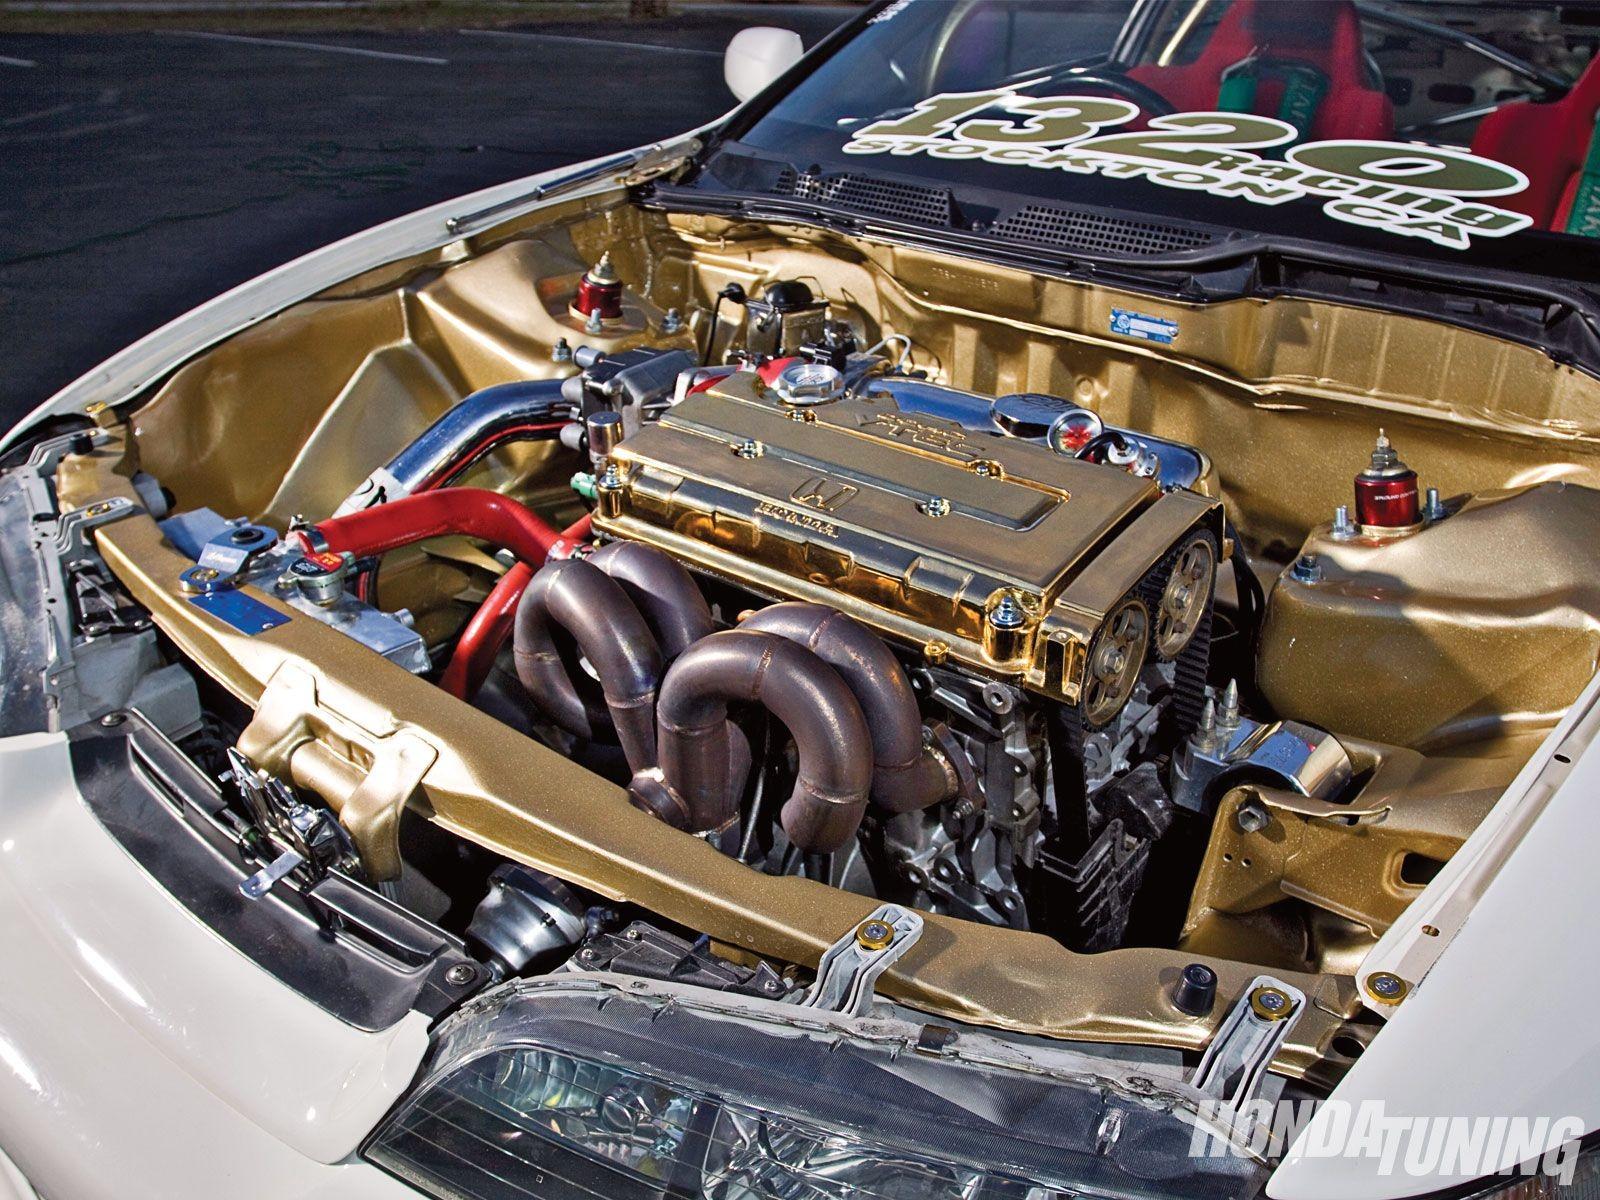 95 acura integra engine diagram 1994 acura integra ls the transformer &  image gallery of 95